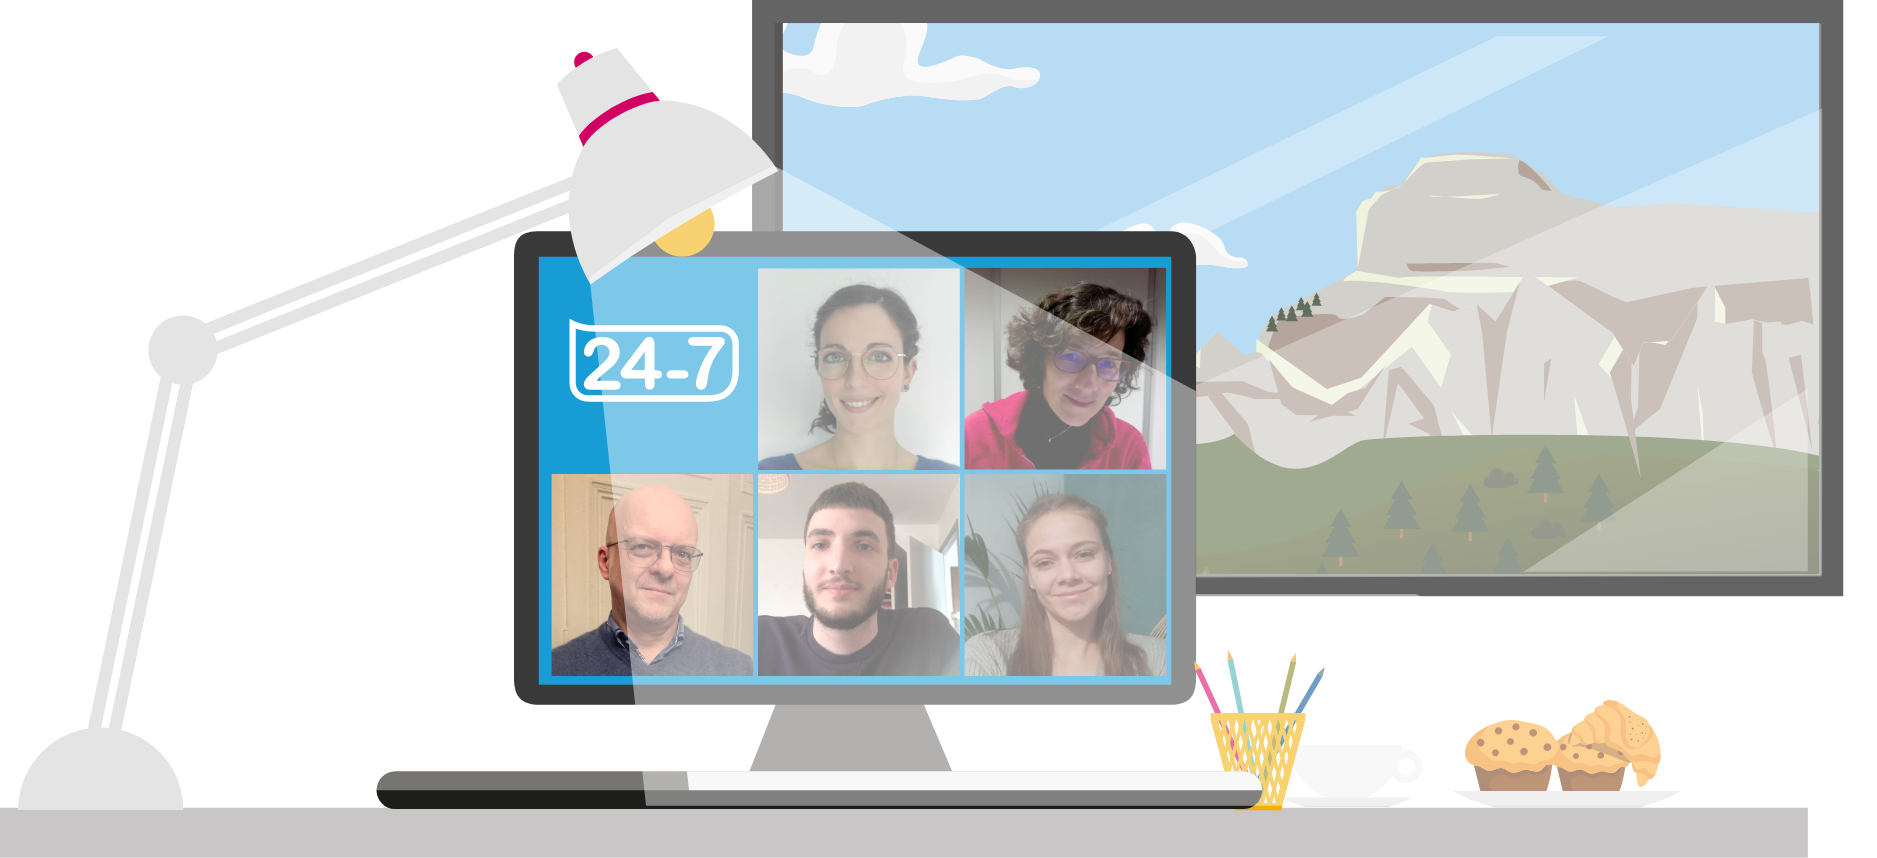 agence web grenoble equipe 24-7